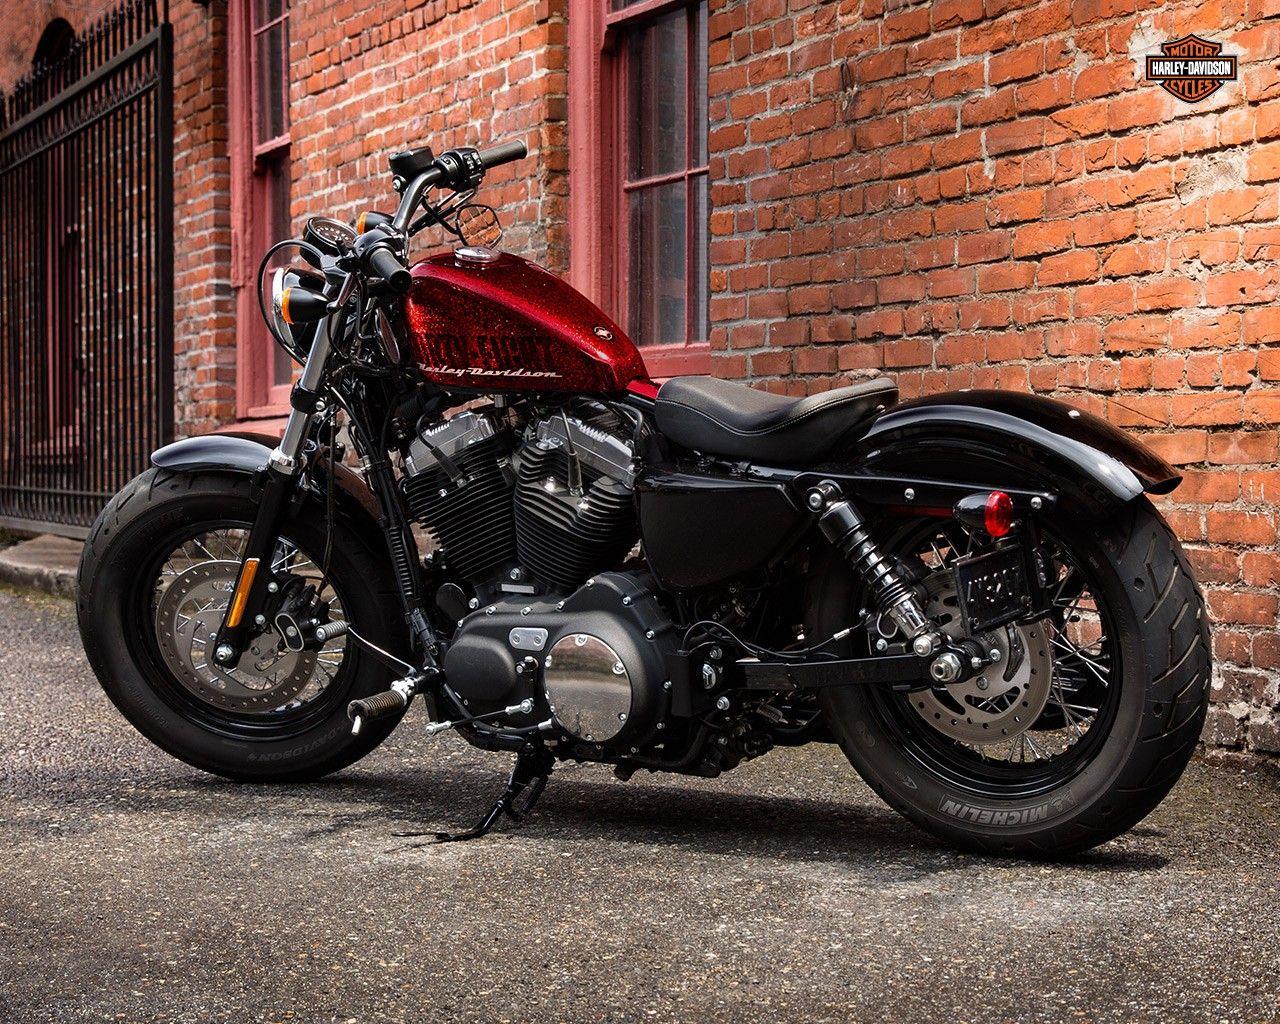 15 Hd Forty Eight Wallpaper 2 Harley Davidson Wallpaper Harley Davidson Motorcycles Harley Davidson Sportster